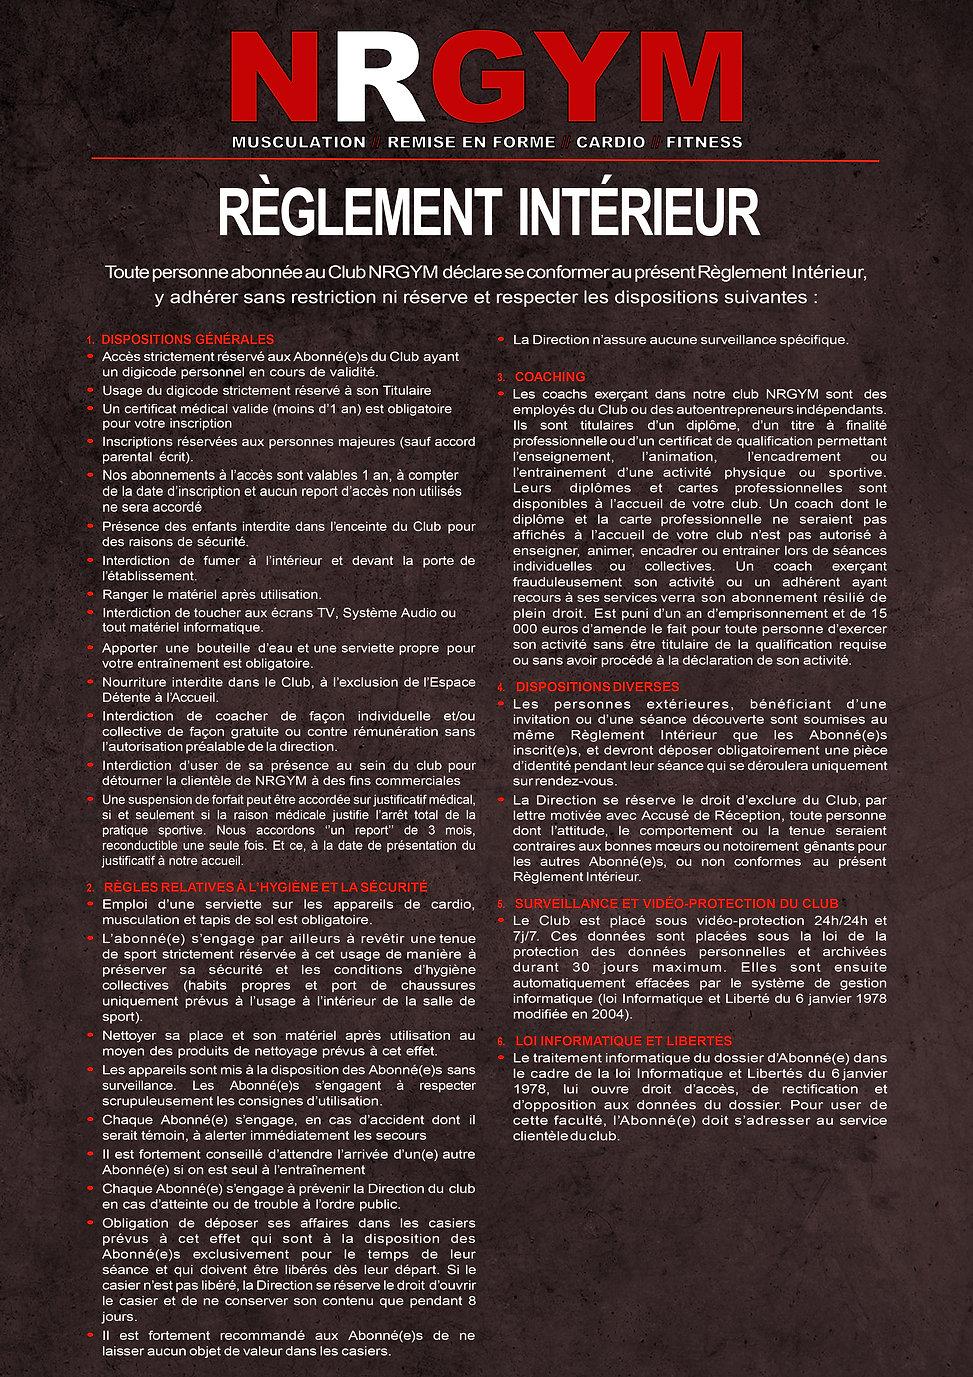 REGLEMENT-INTERIEUR NRGYM (1)-1.jpg